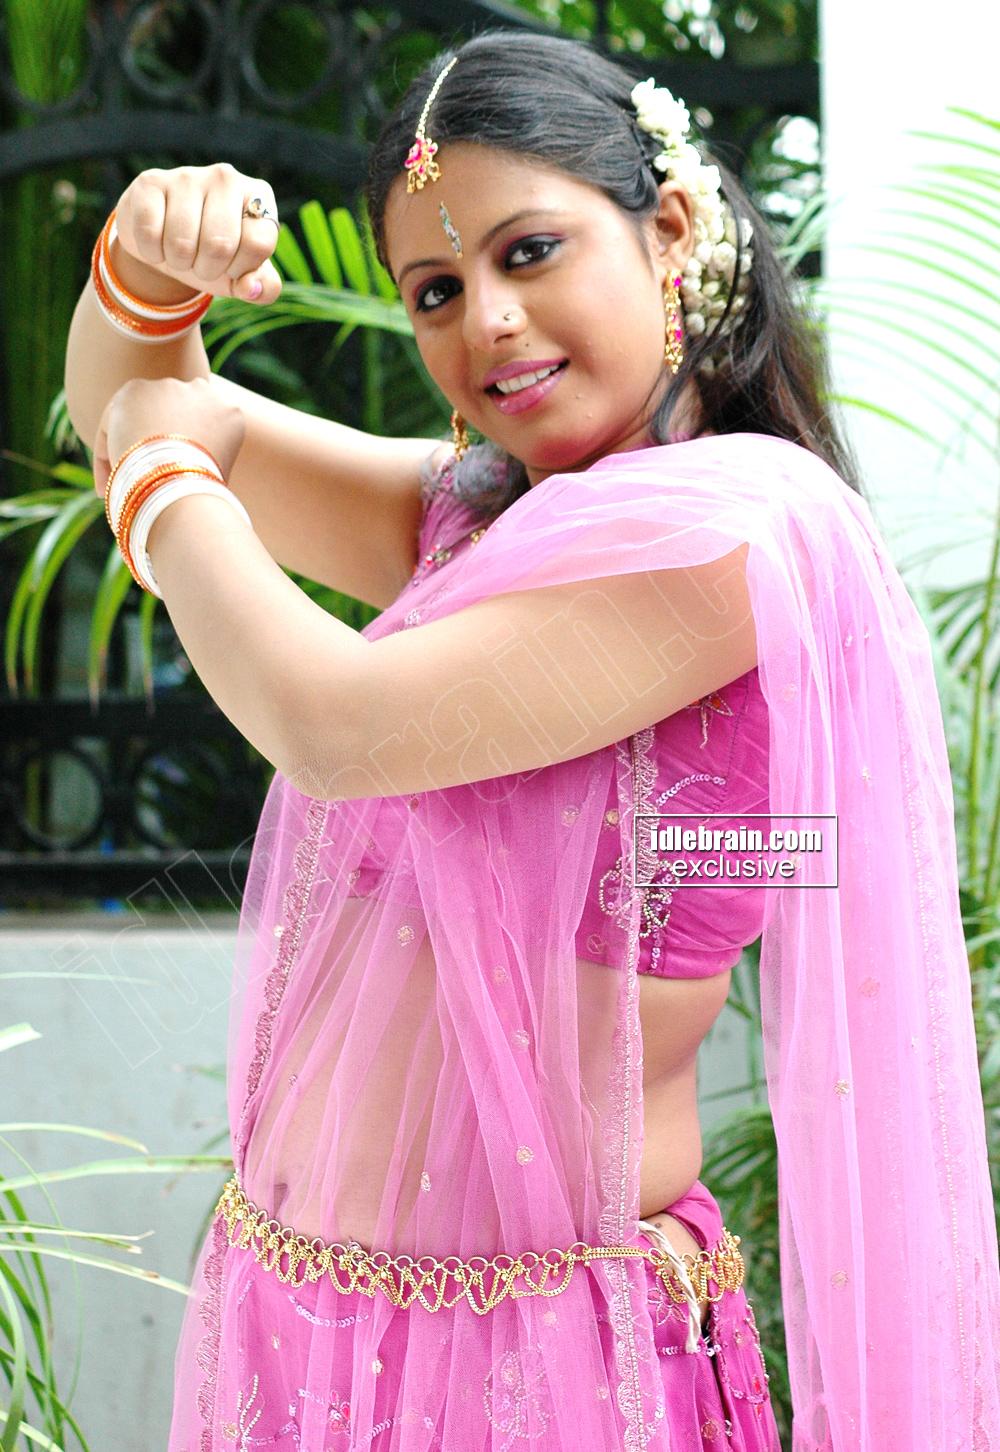 South Actress Sunakshi Masala Pics Desi Masala Babe Hot Sunakshi Tamil Hot Actress Spicy Photo Gallery